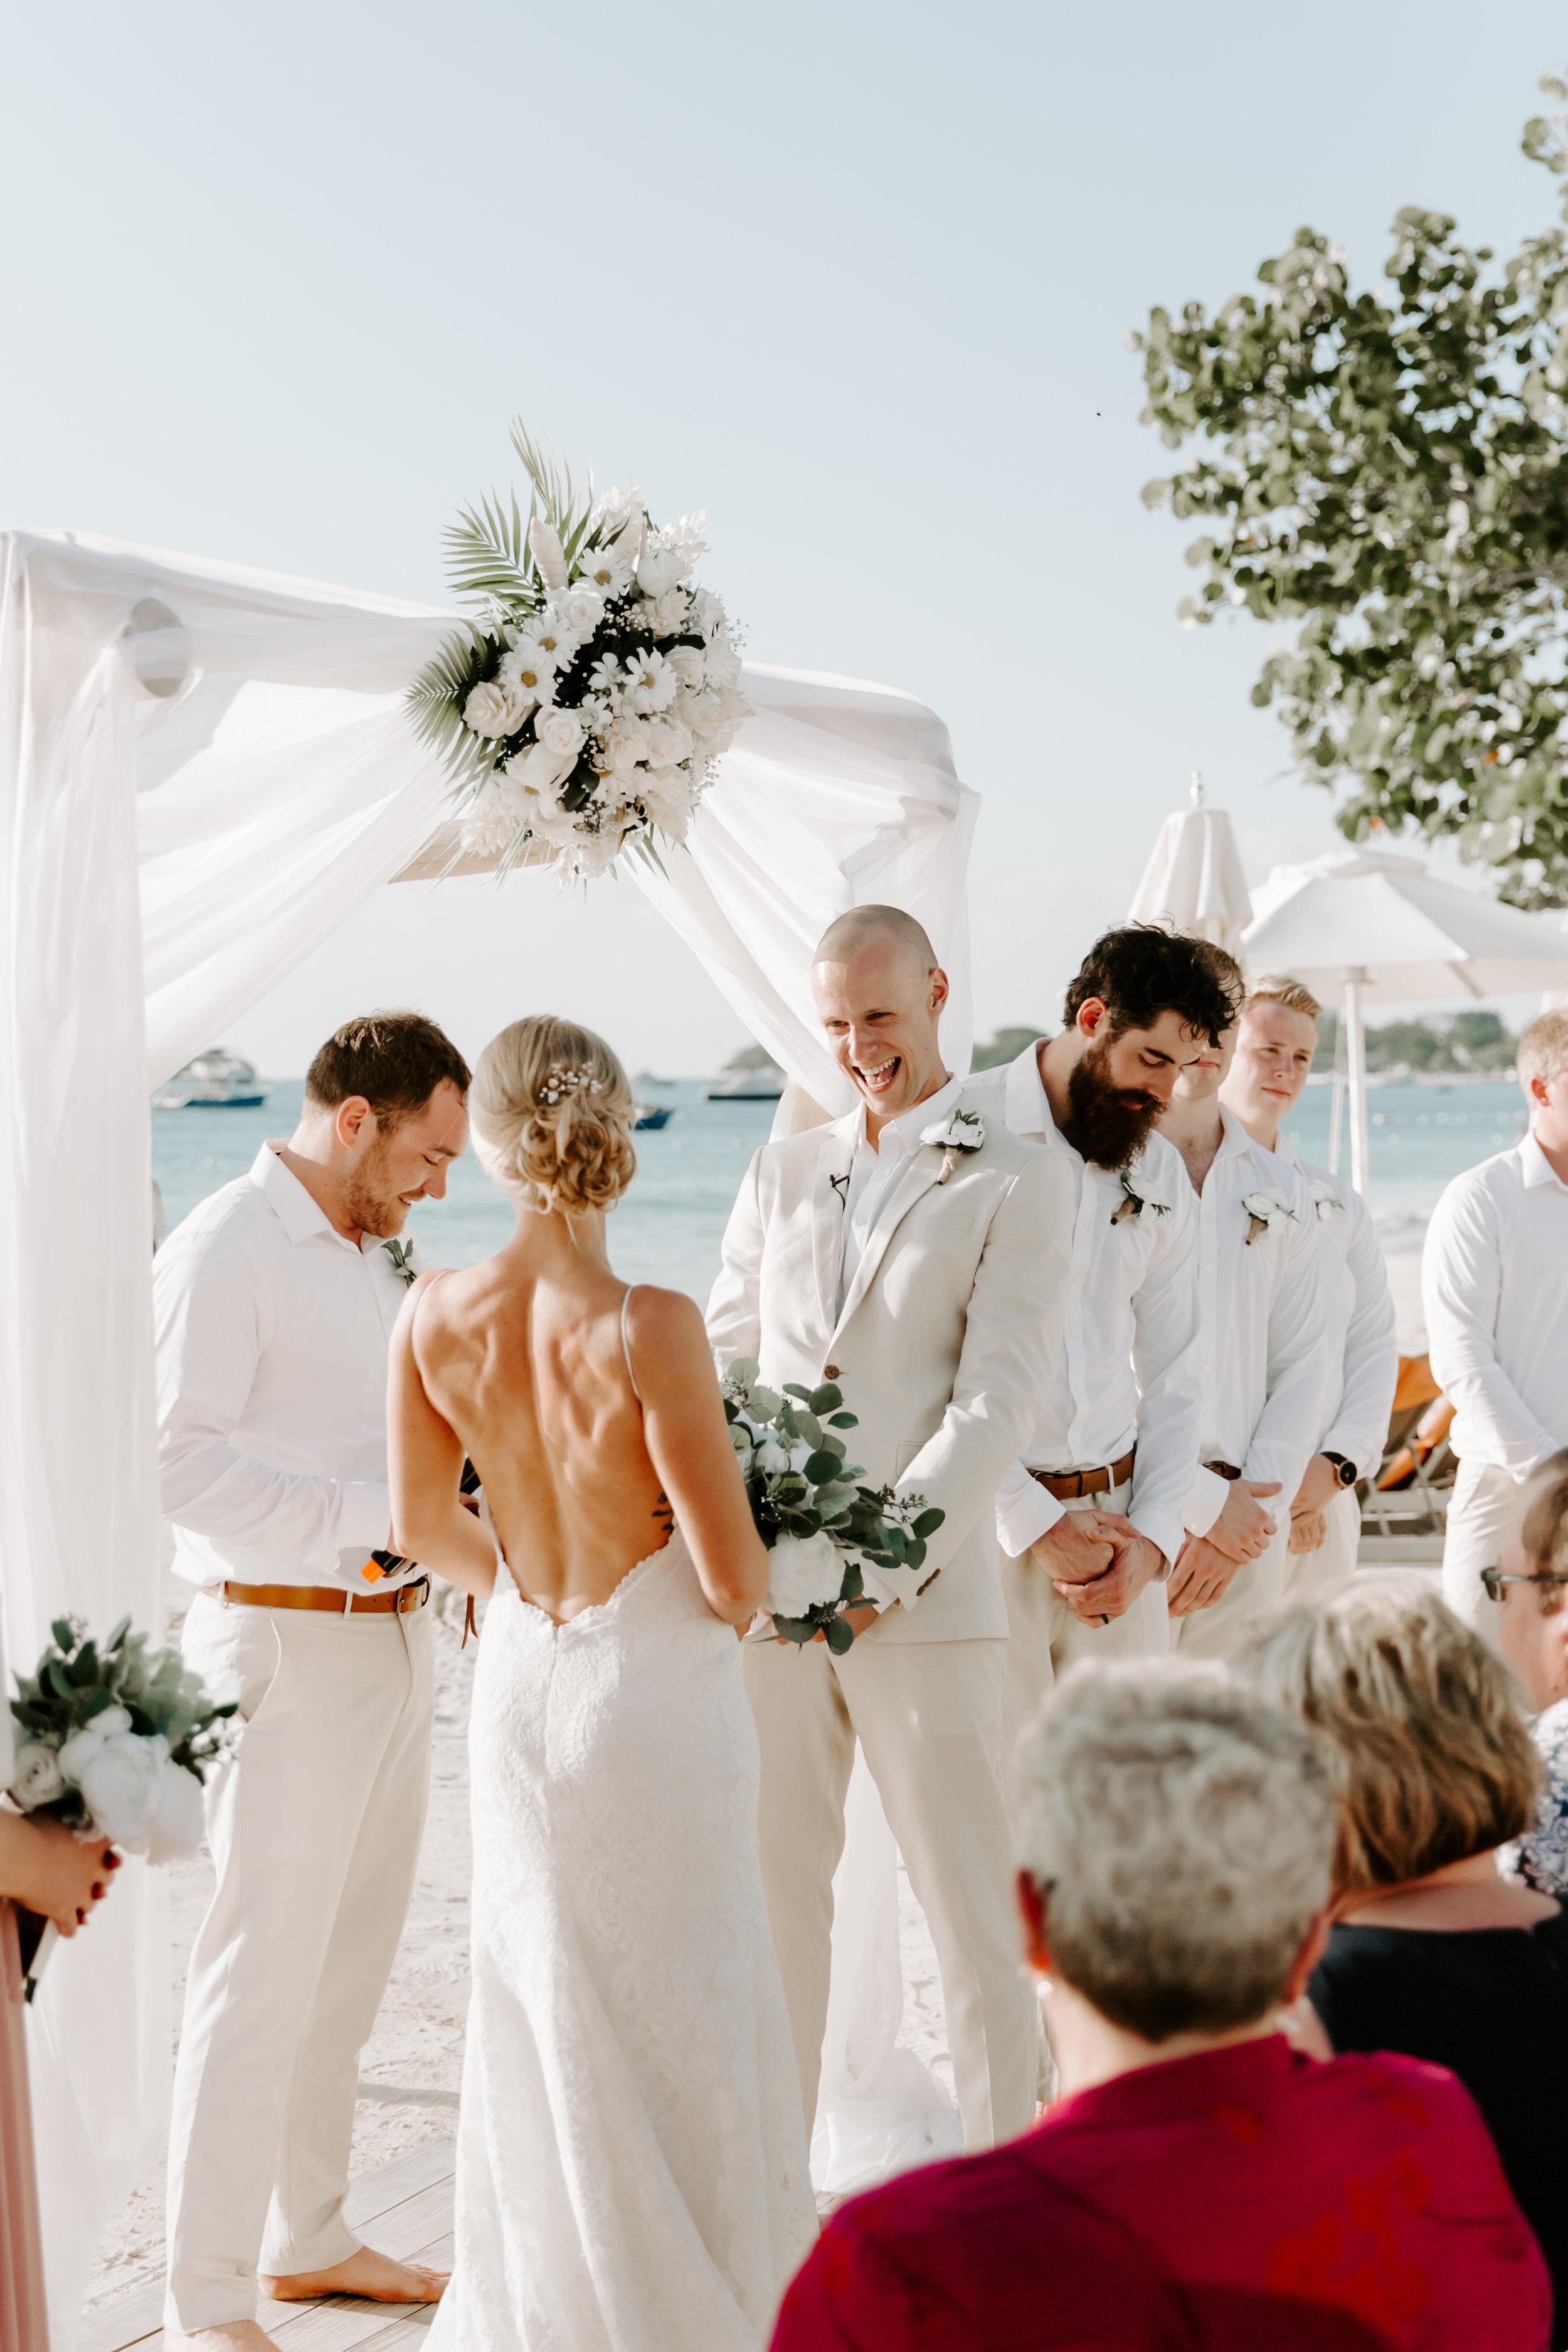 wedding day, beach wedding, wedding ceremony, beach wedding ceremony, destination wedding, backless wedding dress, katie may, katie may bridal, define fettle